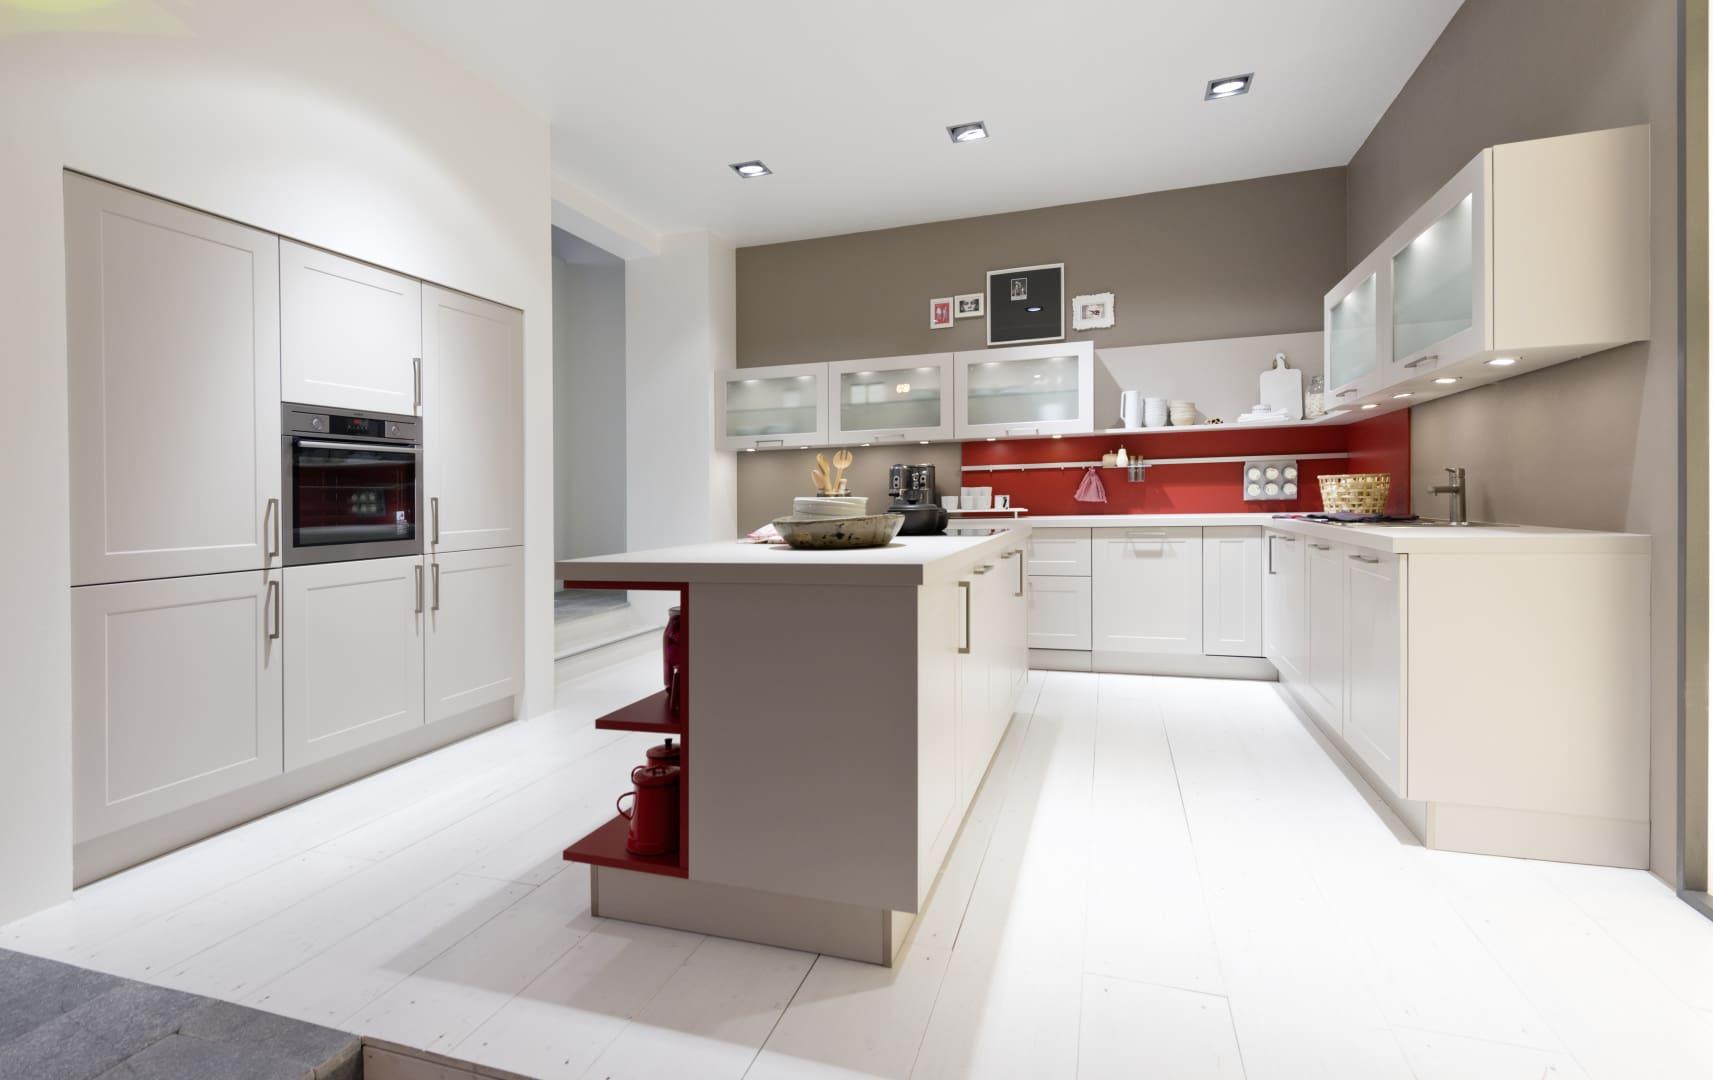 kremowa kuchnia z ramką nolte kuchen model frame lack